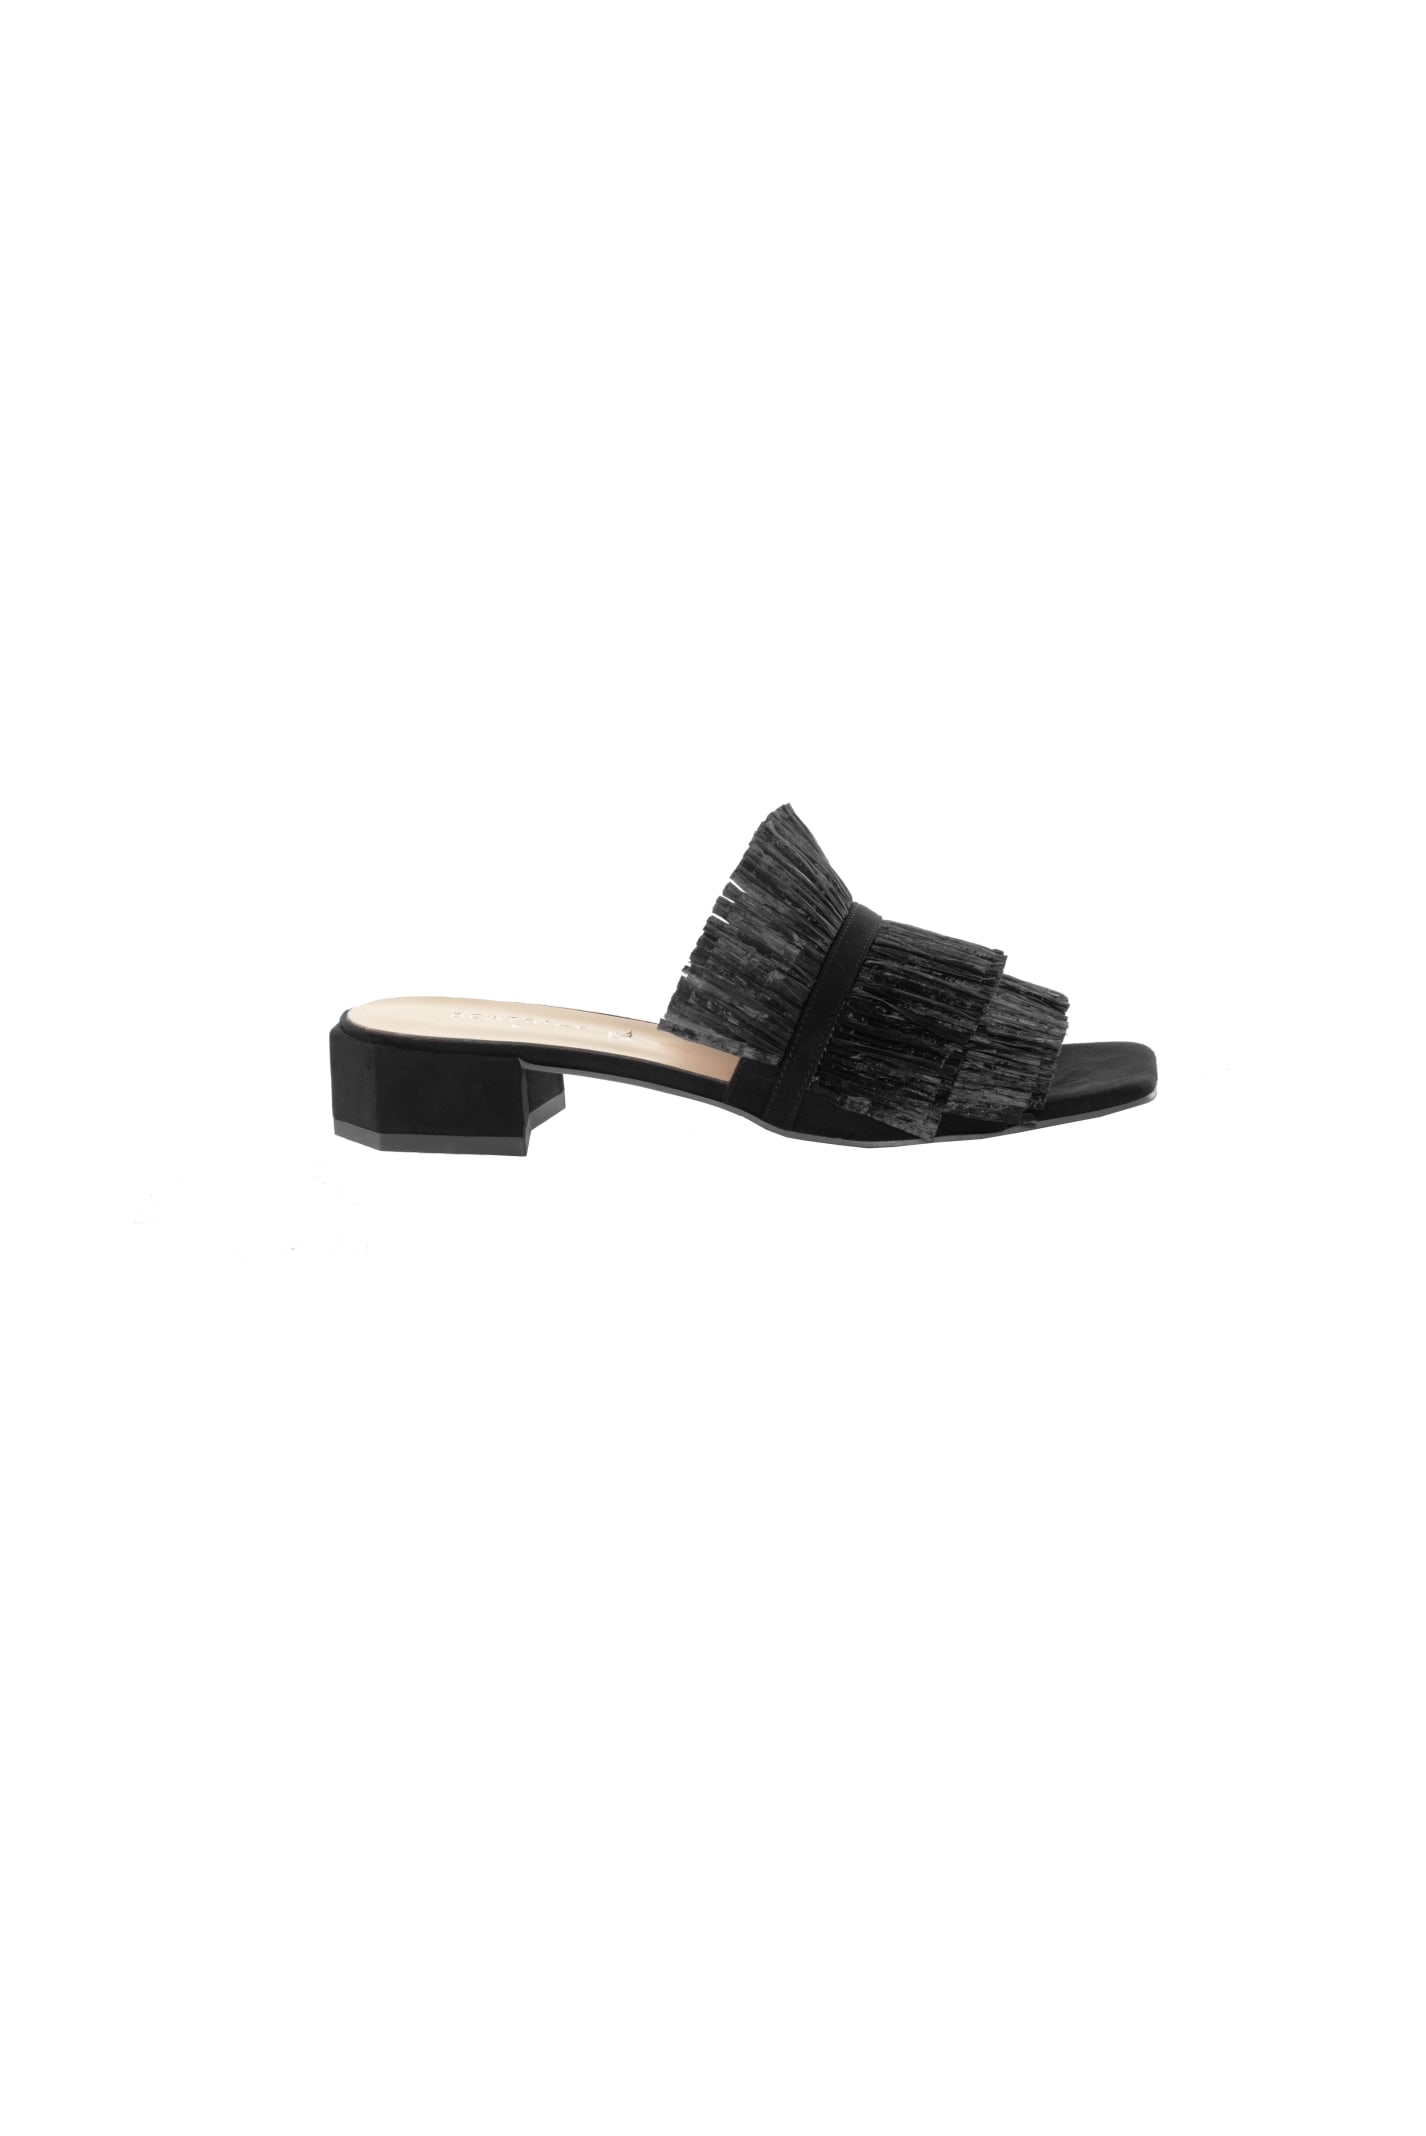 Beatrice.b Flat Shoes